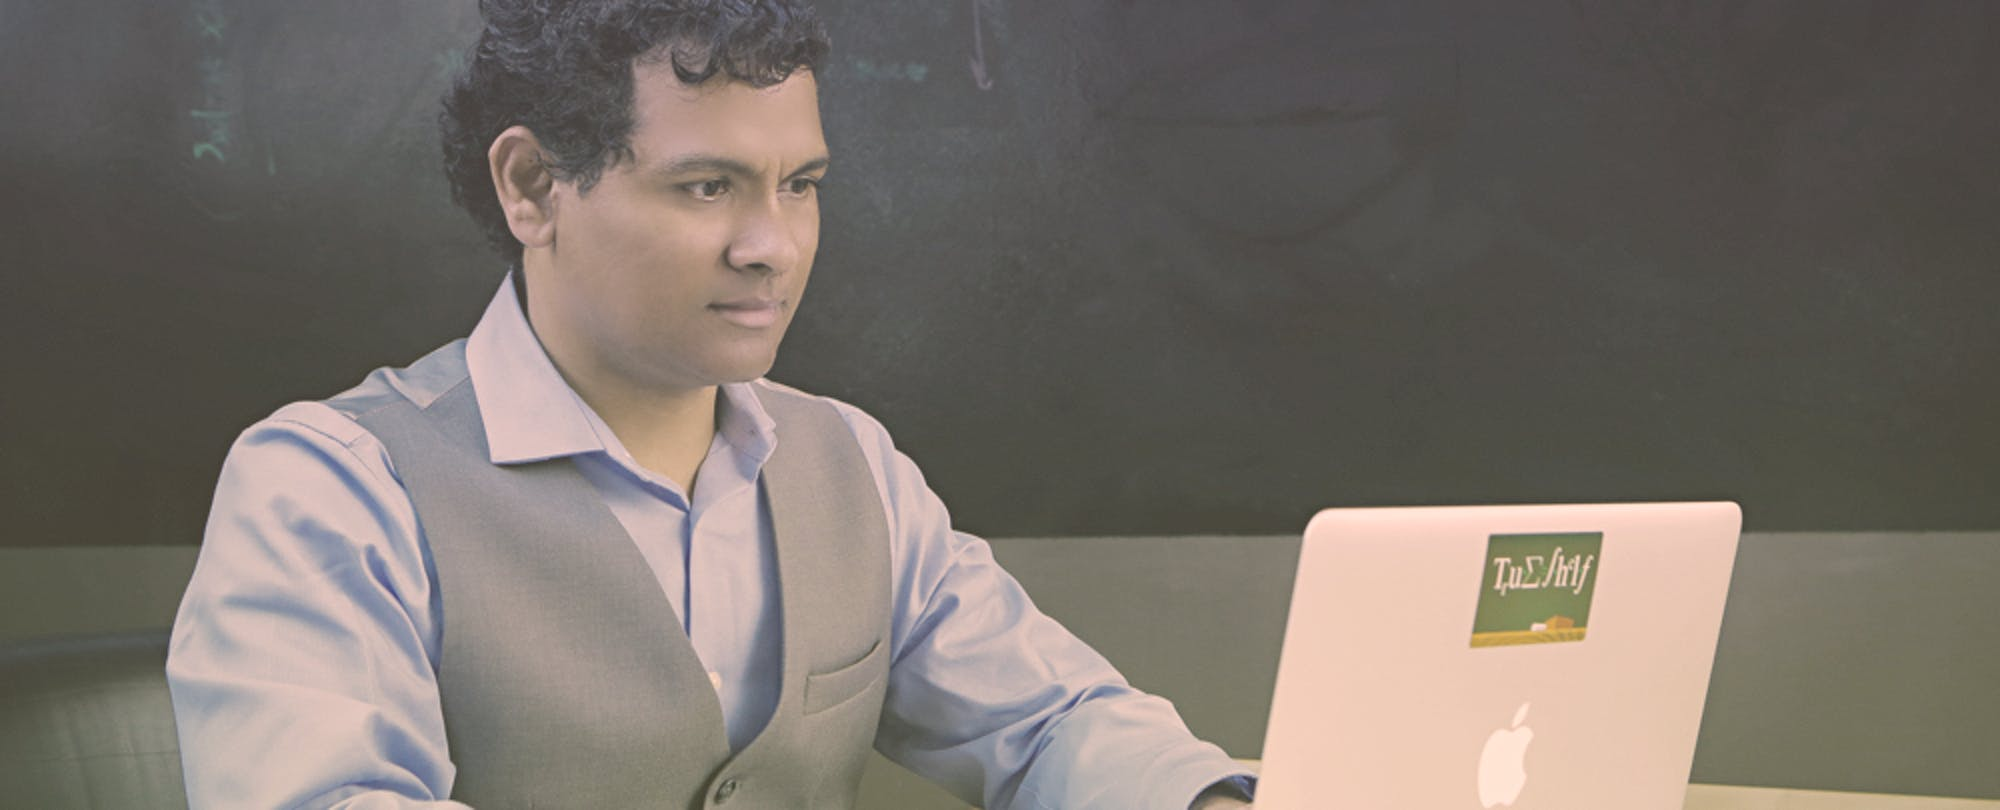 The Future Is Adaptive: An Interview with TrueShelf's Shiva Kintali